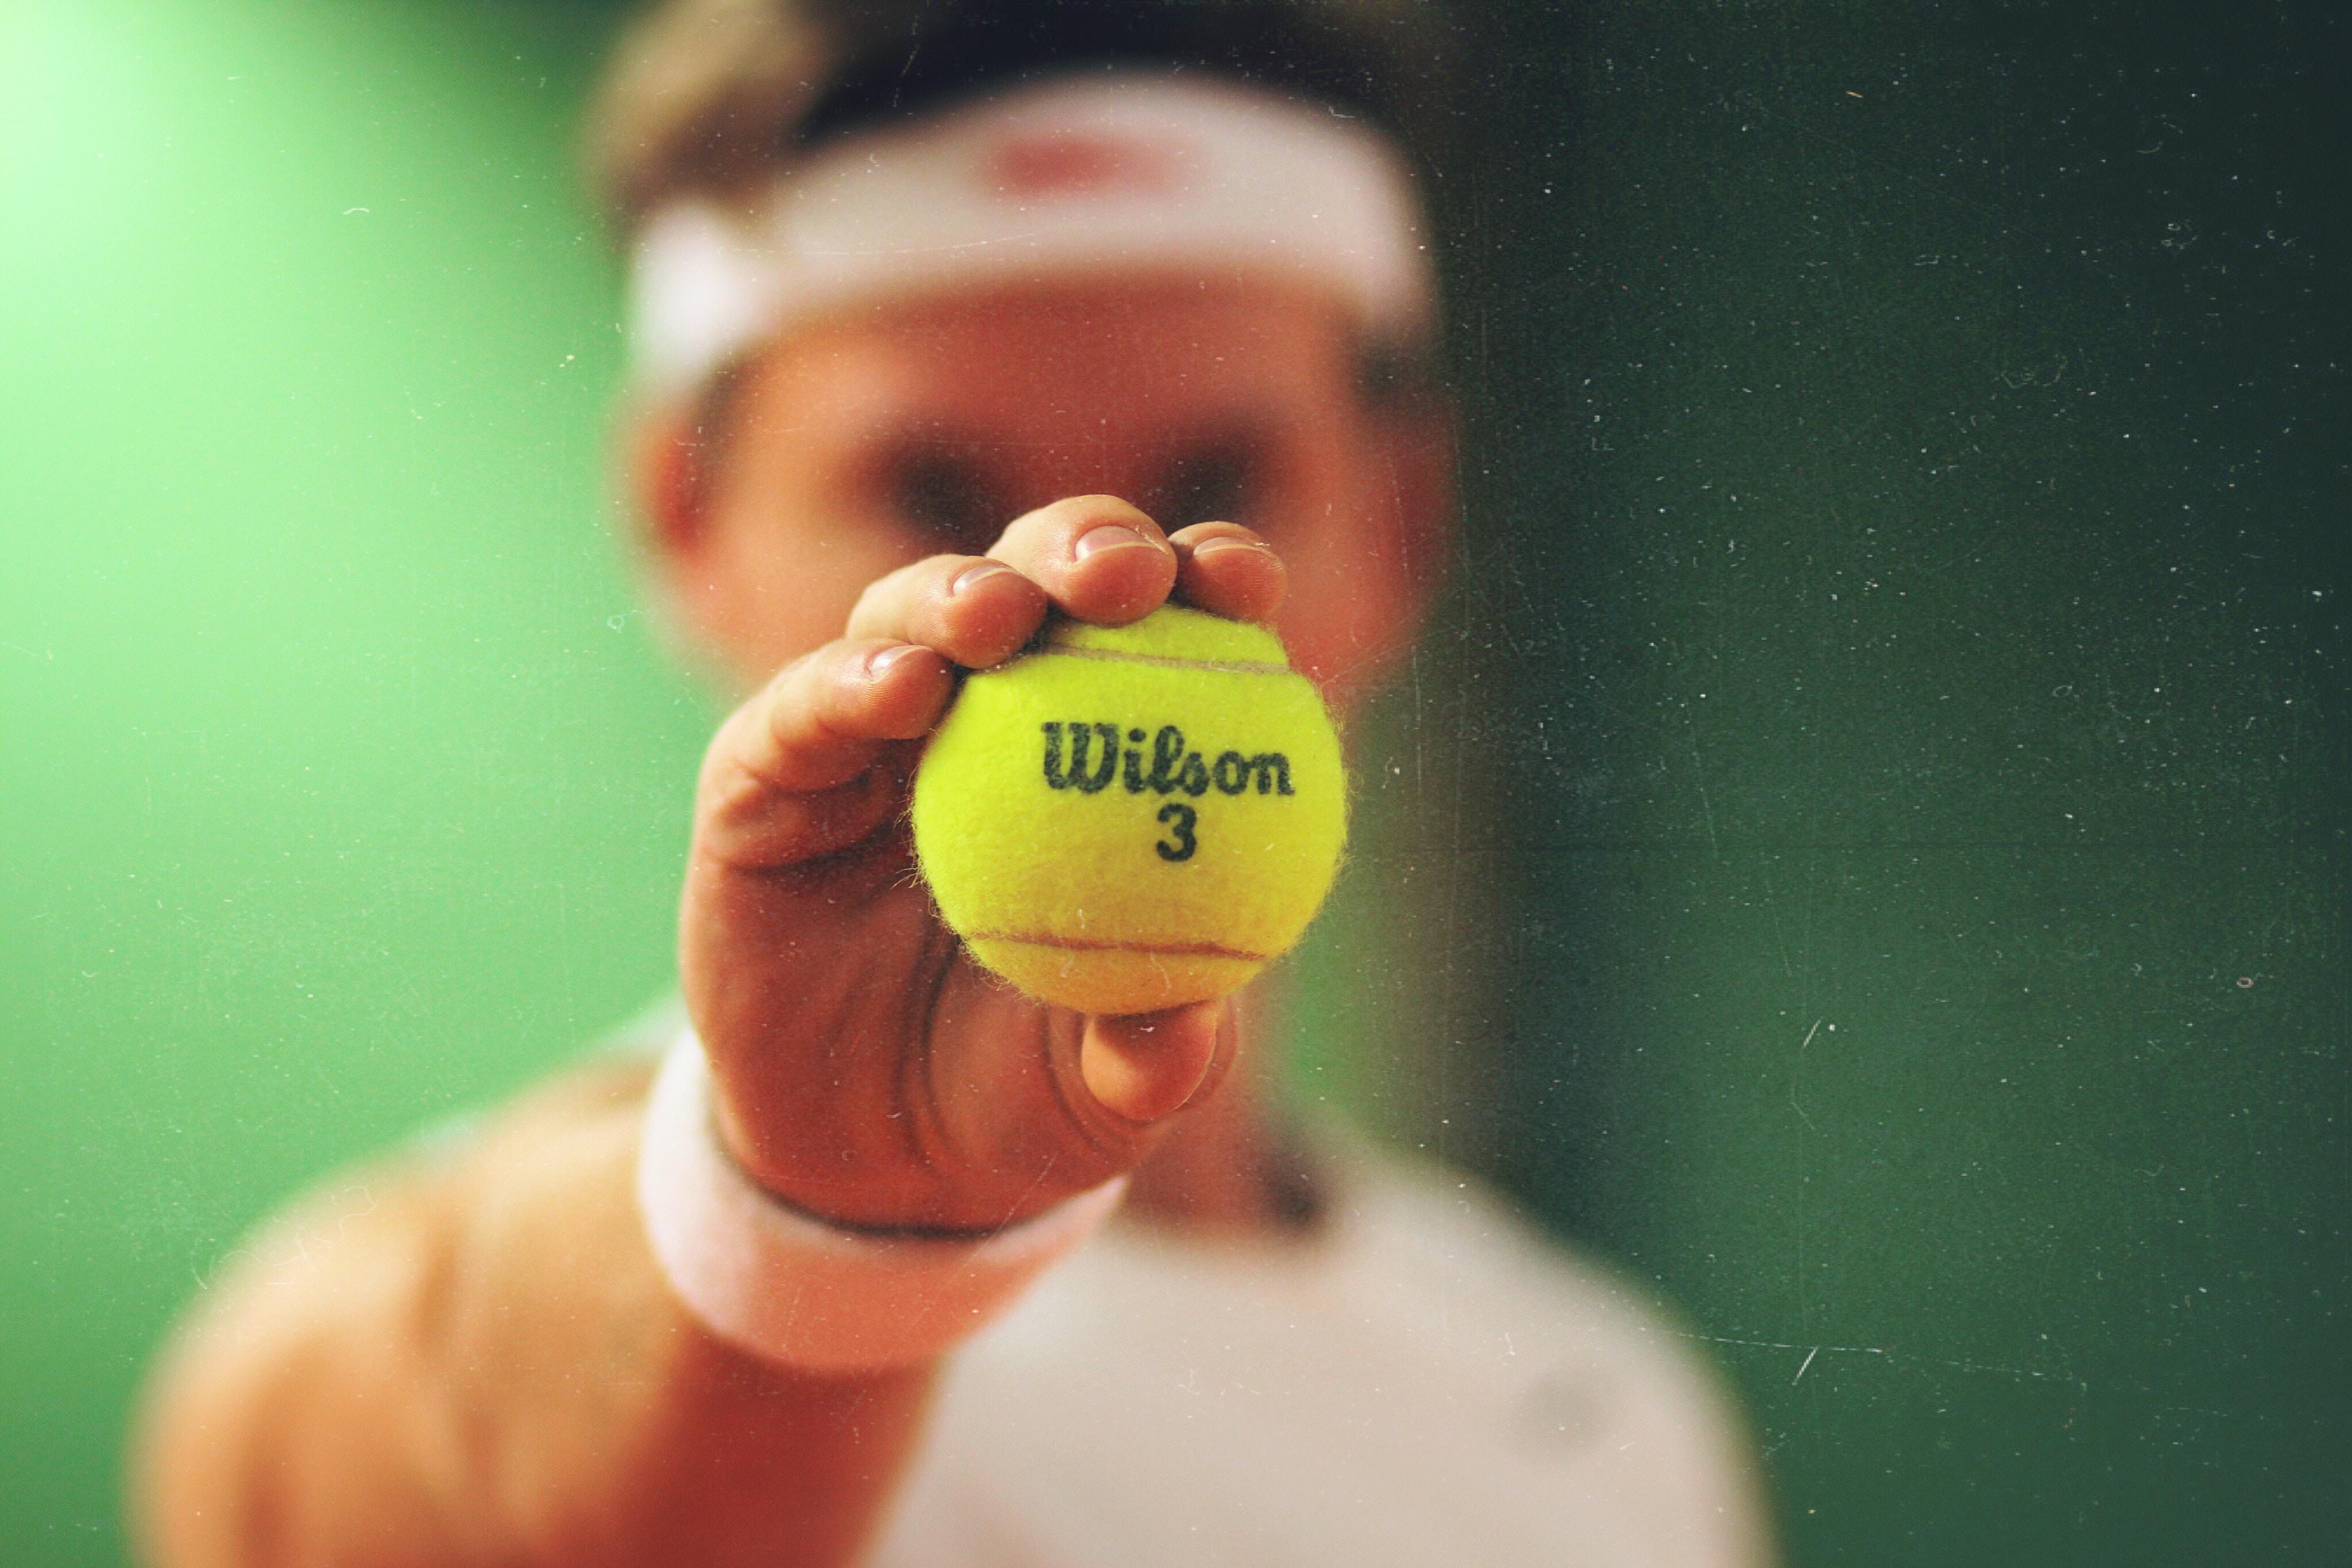 person holding green Wilson tennis ball